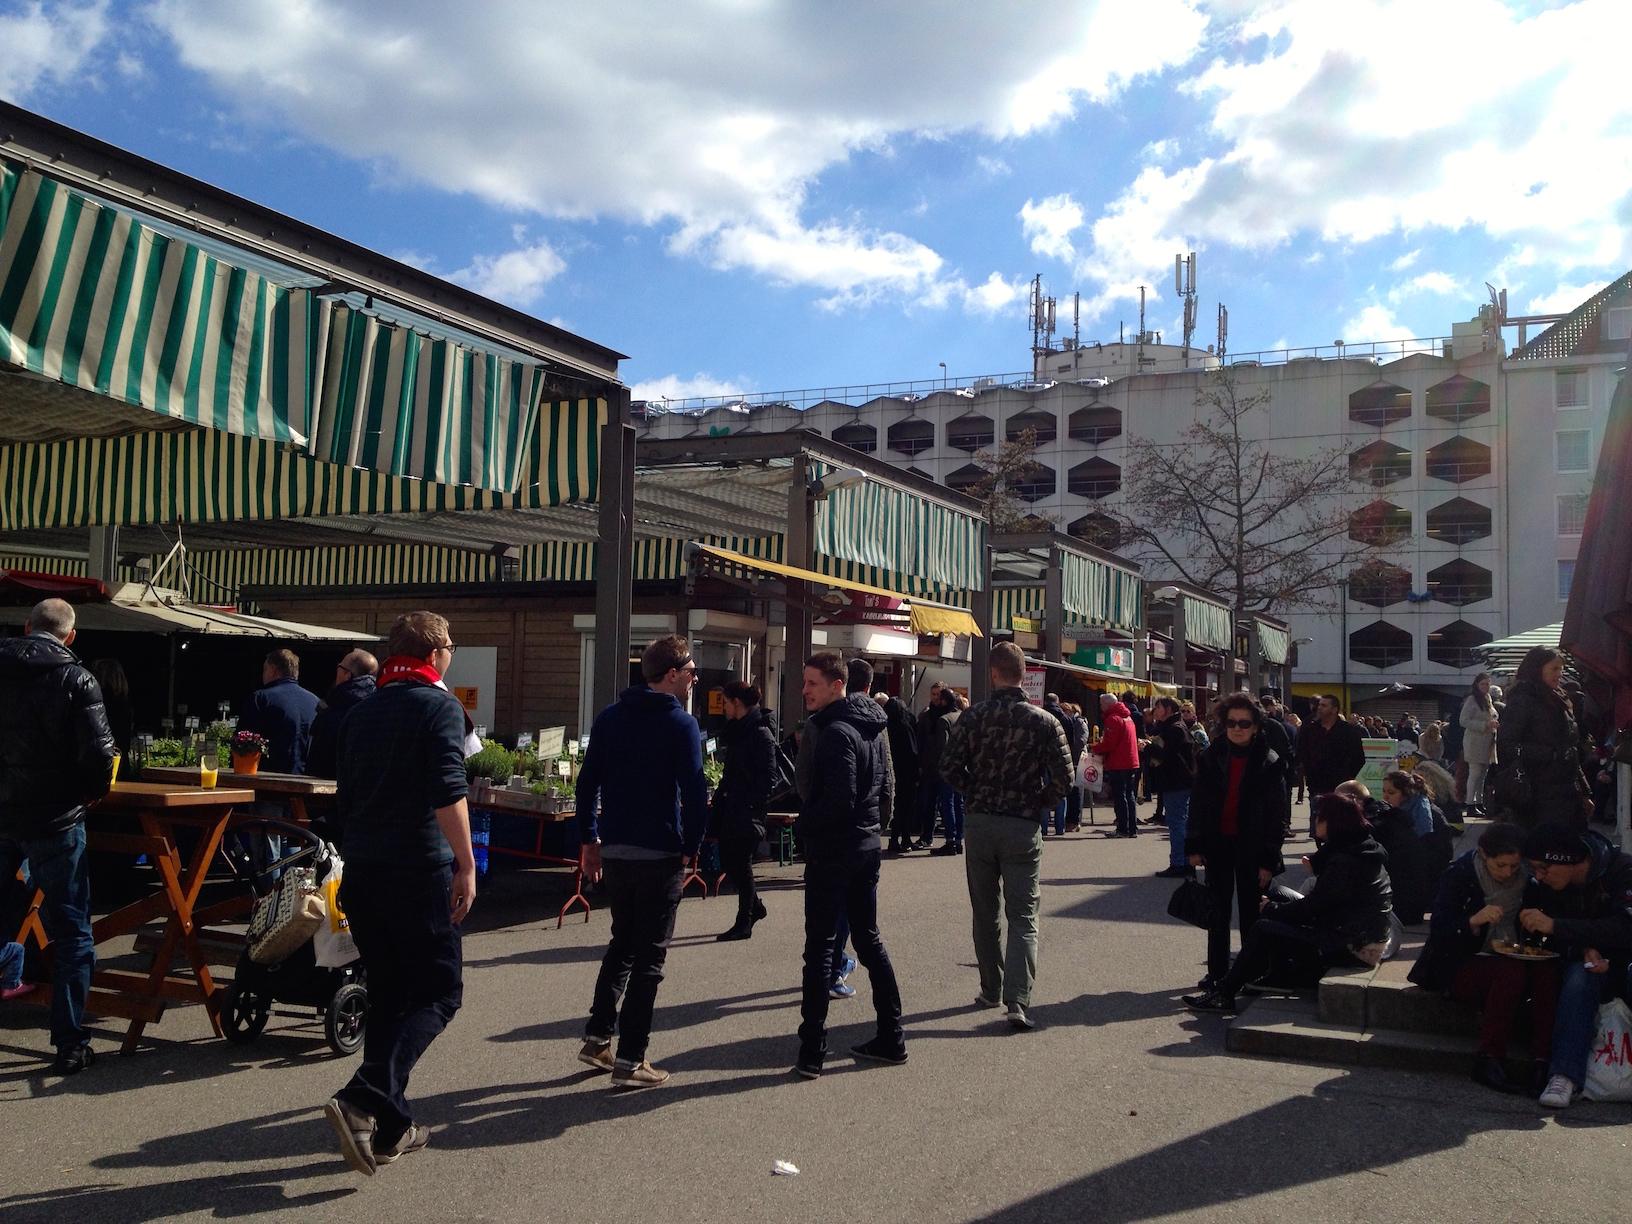 Carlsplatz market on Saturday